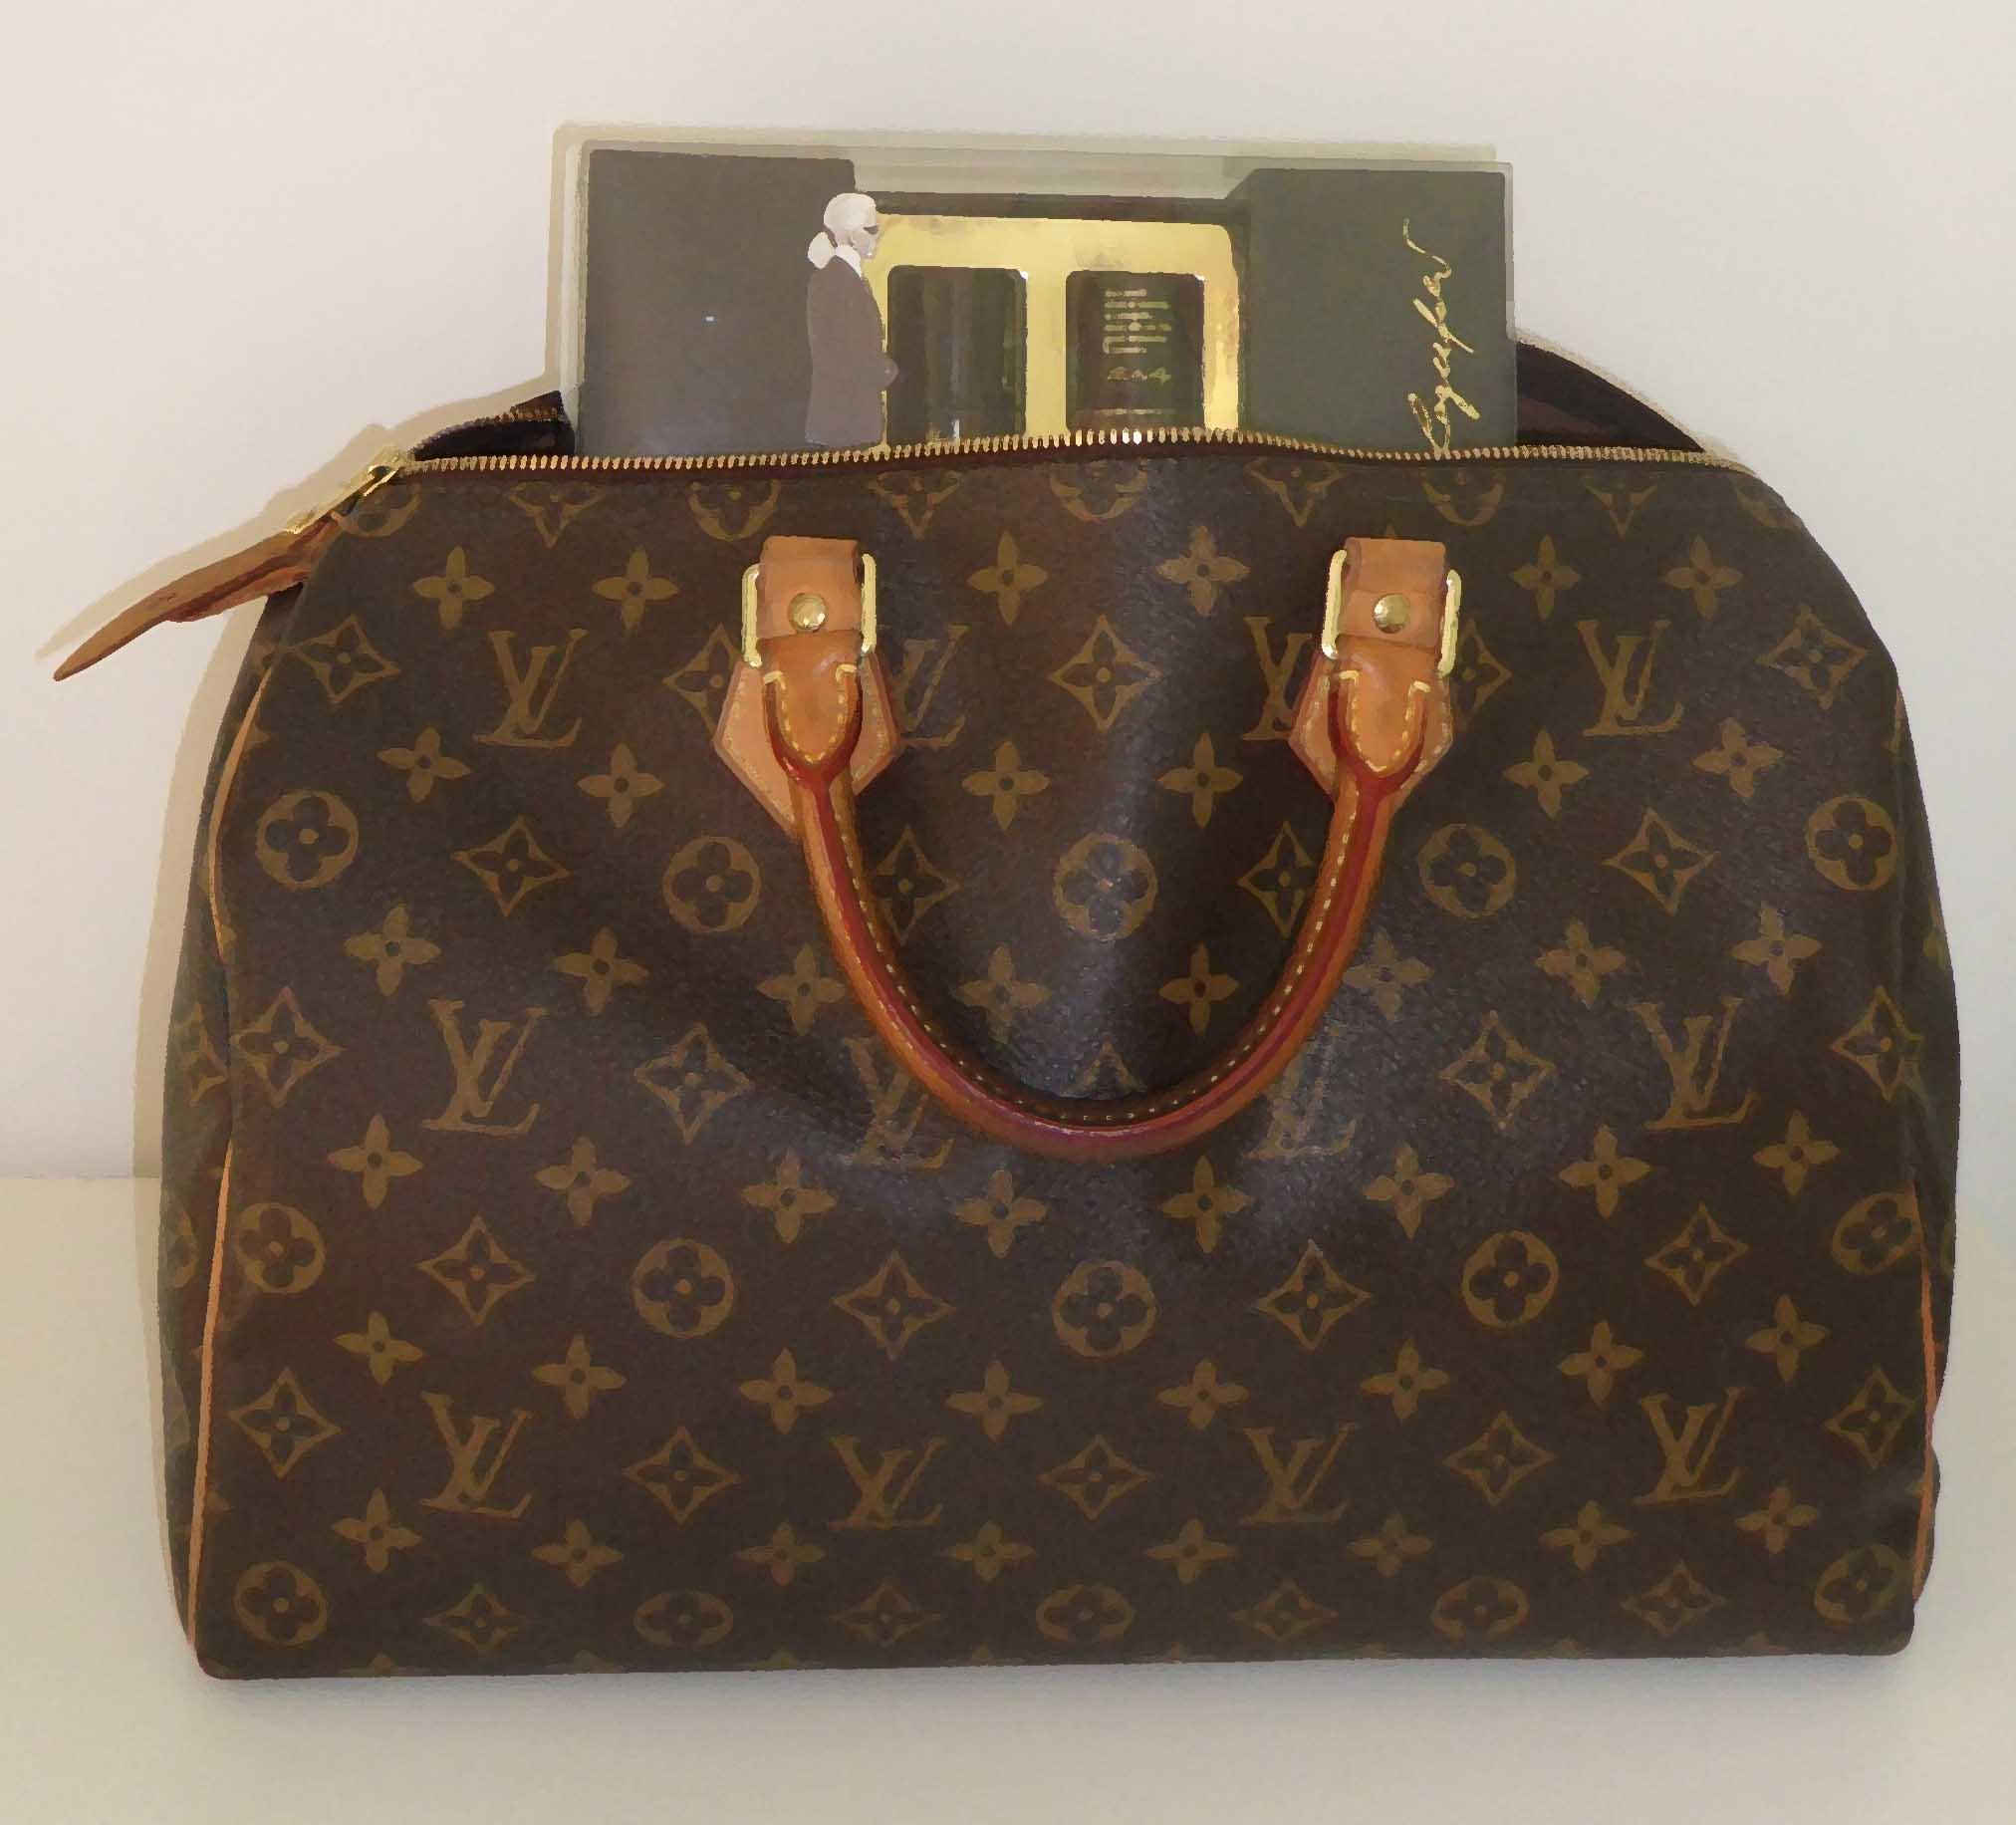 Sac a main haute couture lugo trina blog - Couture sac a main ...